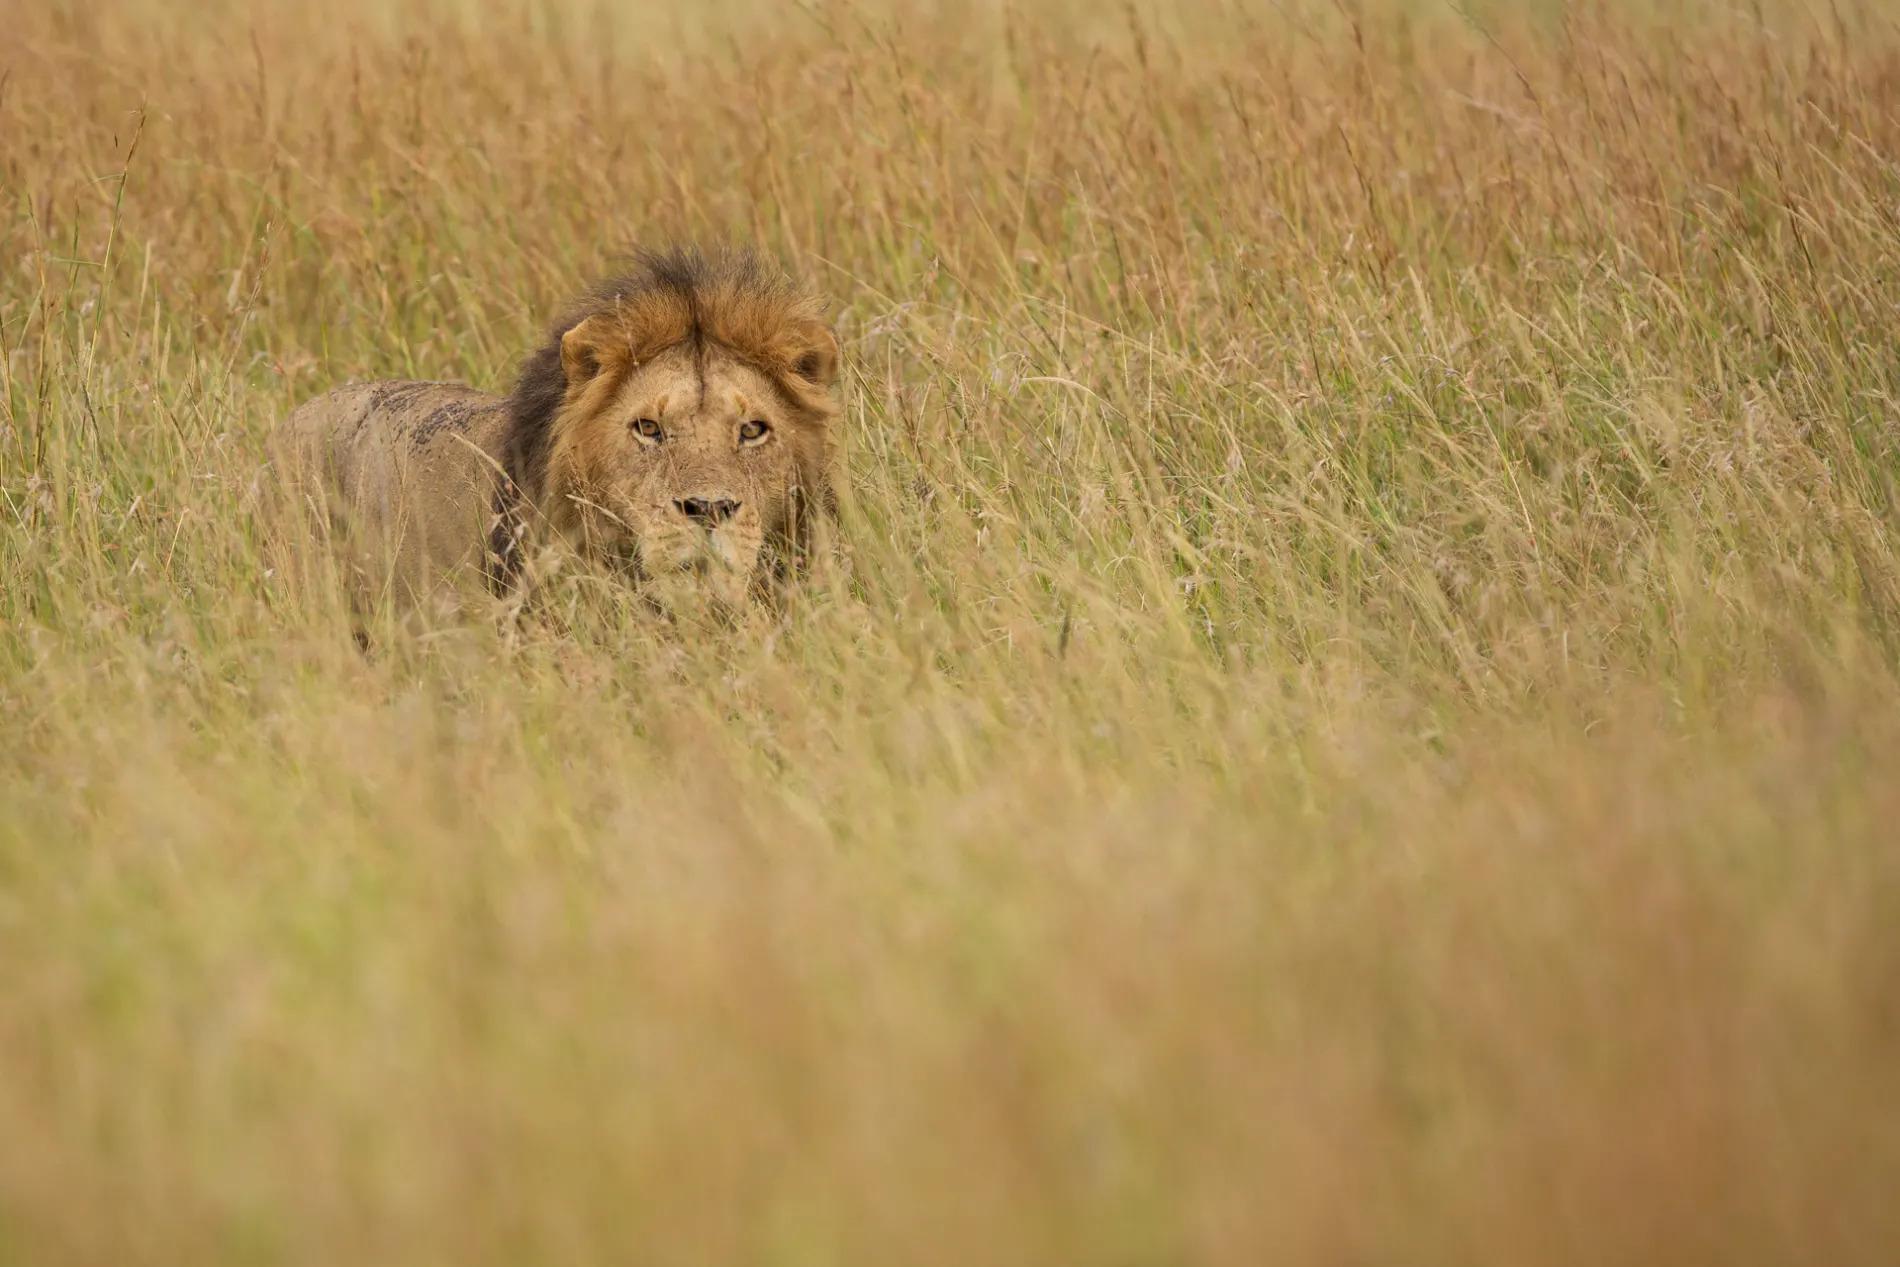 Male Lion in long grass